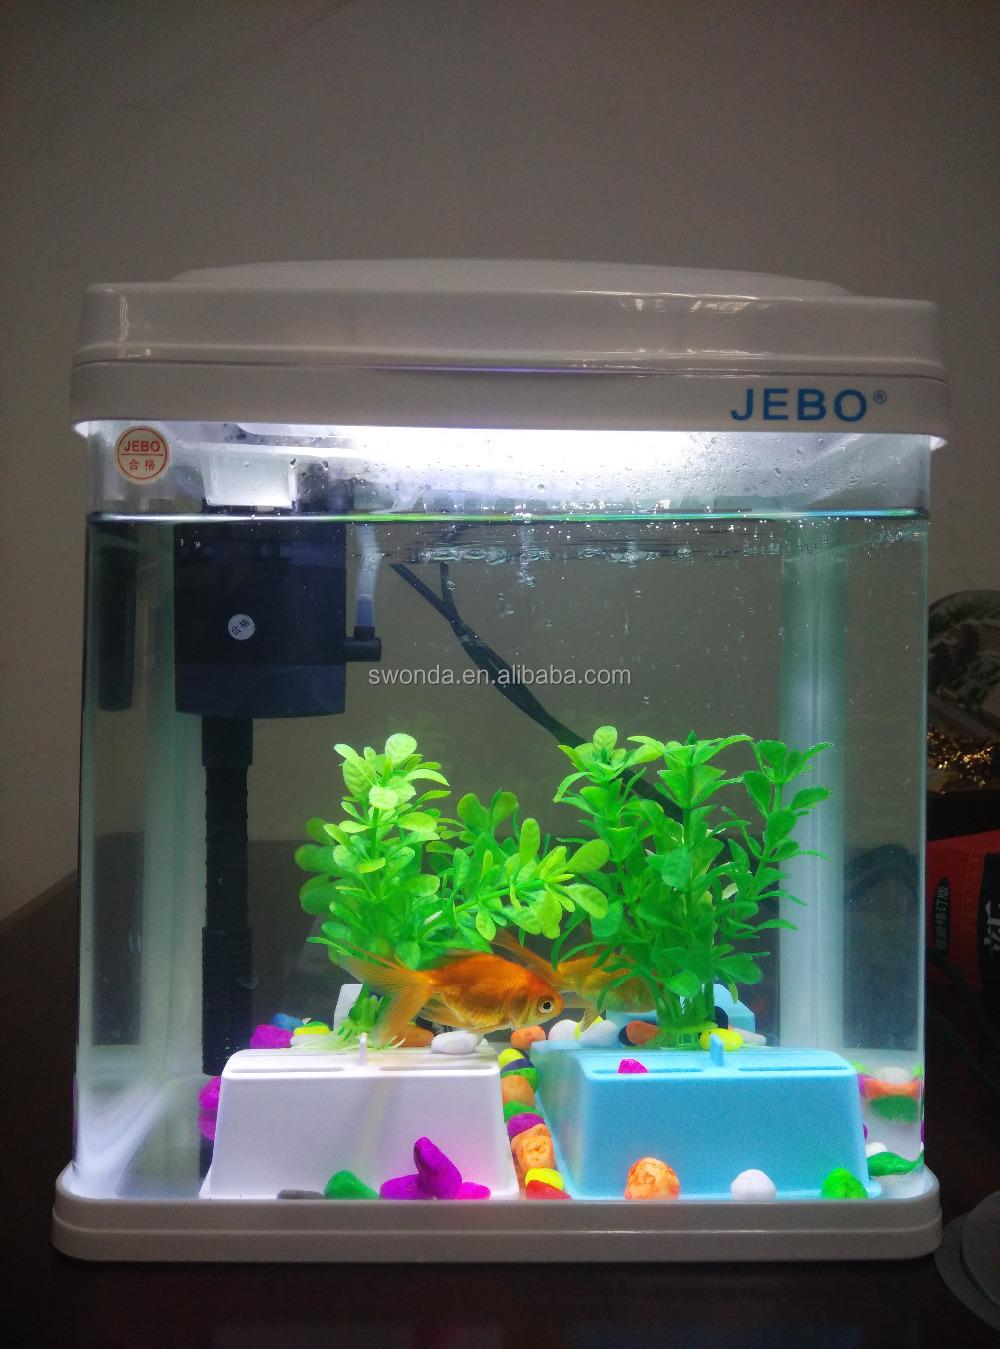 Jebo aquarium fish tank sale - Pocket Size Hot Sale Indoor Marine Fish Tank Aquarium Buy Aquarium Indoor Fish Aquarium Hot Sale Indoor Fish Aquarium Product On Alibaba Com